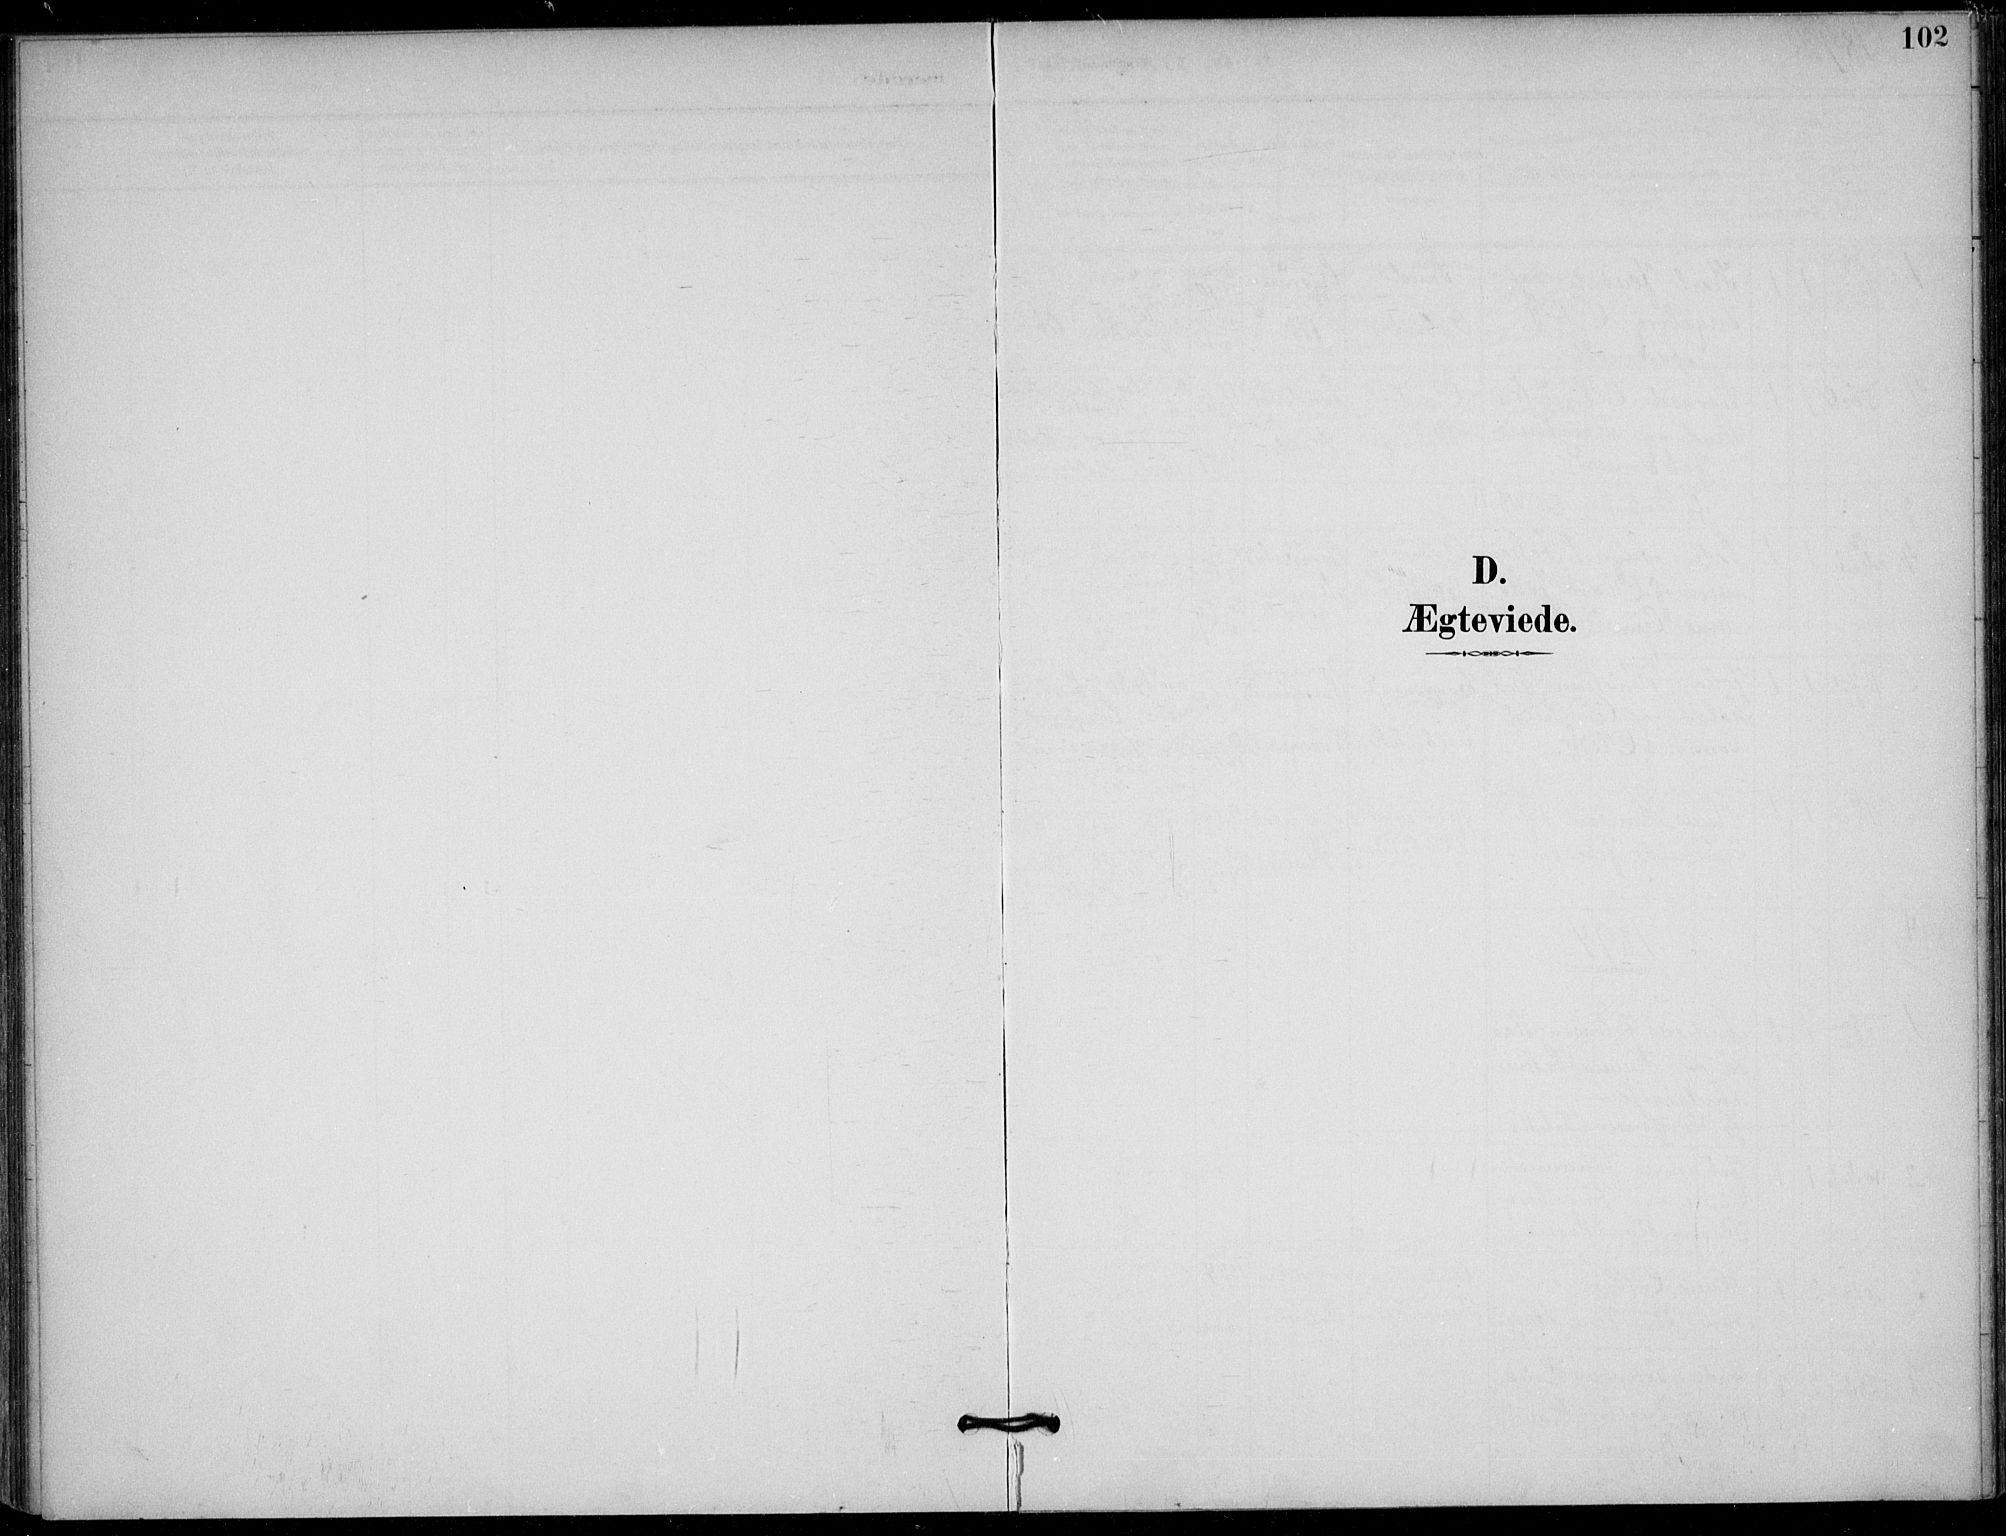 SAKO, Solum kirkebøker, F/Fb/L0002: Ministerialbok nr. II 2, 1893-1901, s. 102